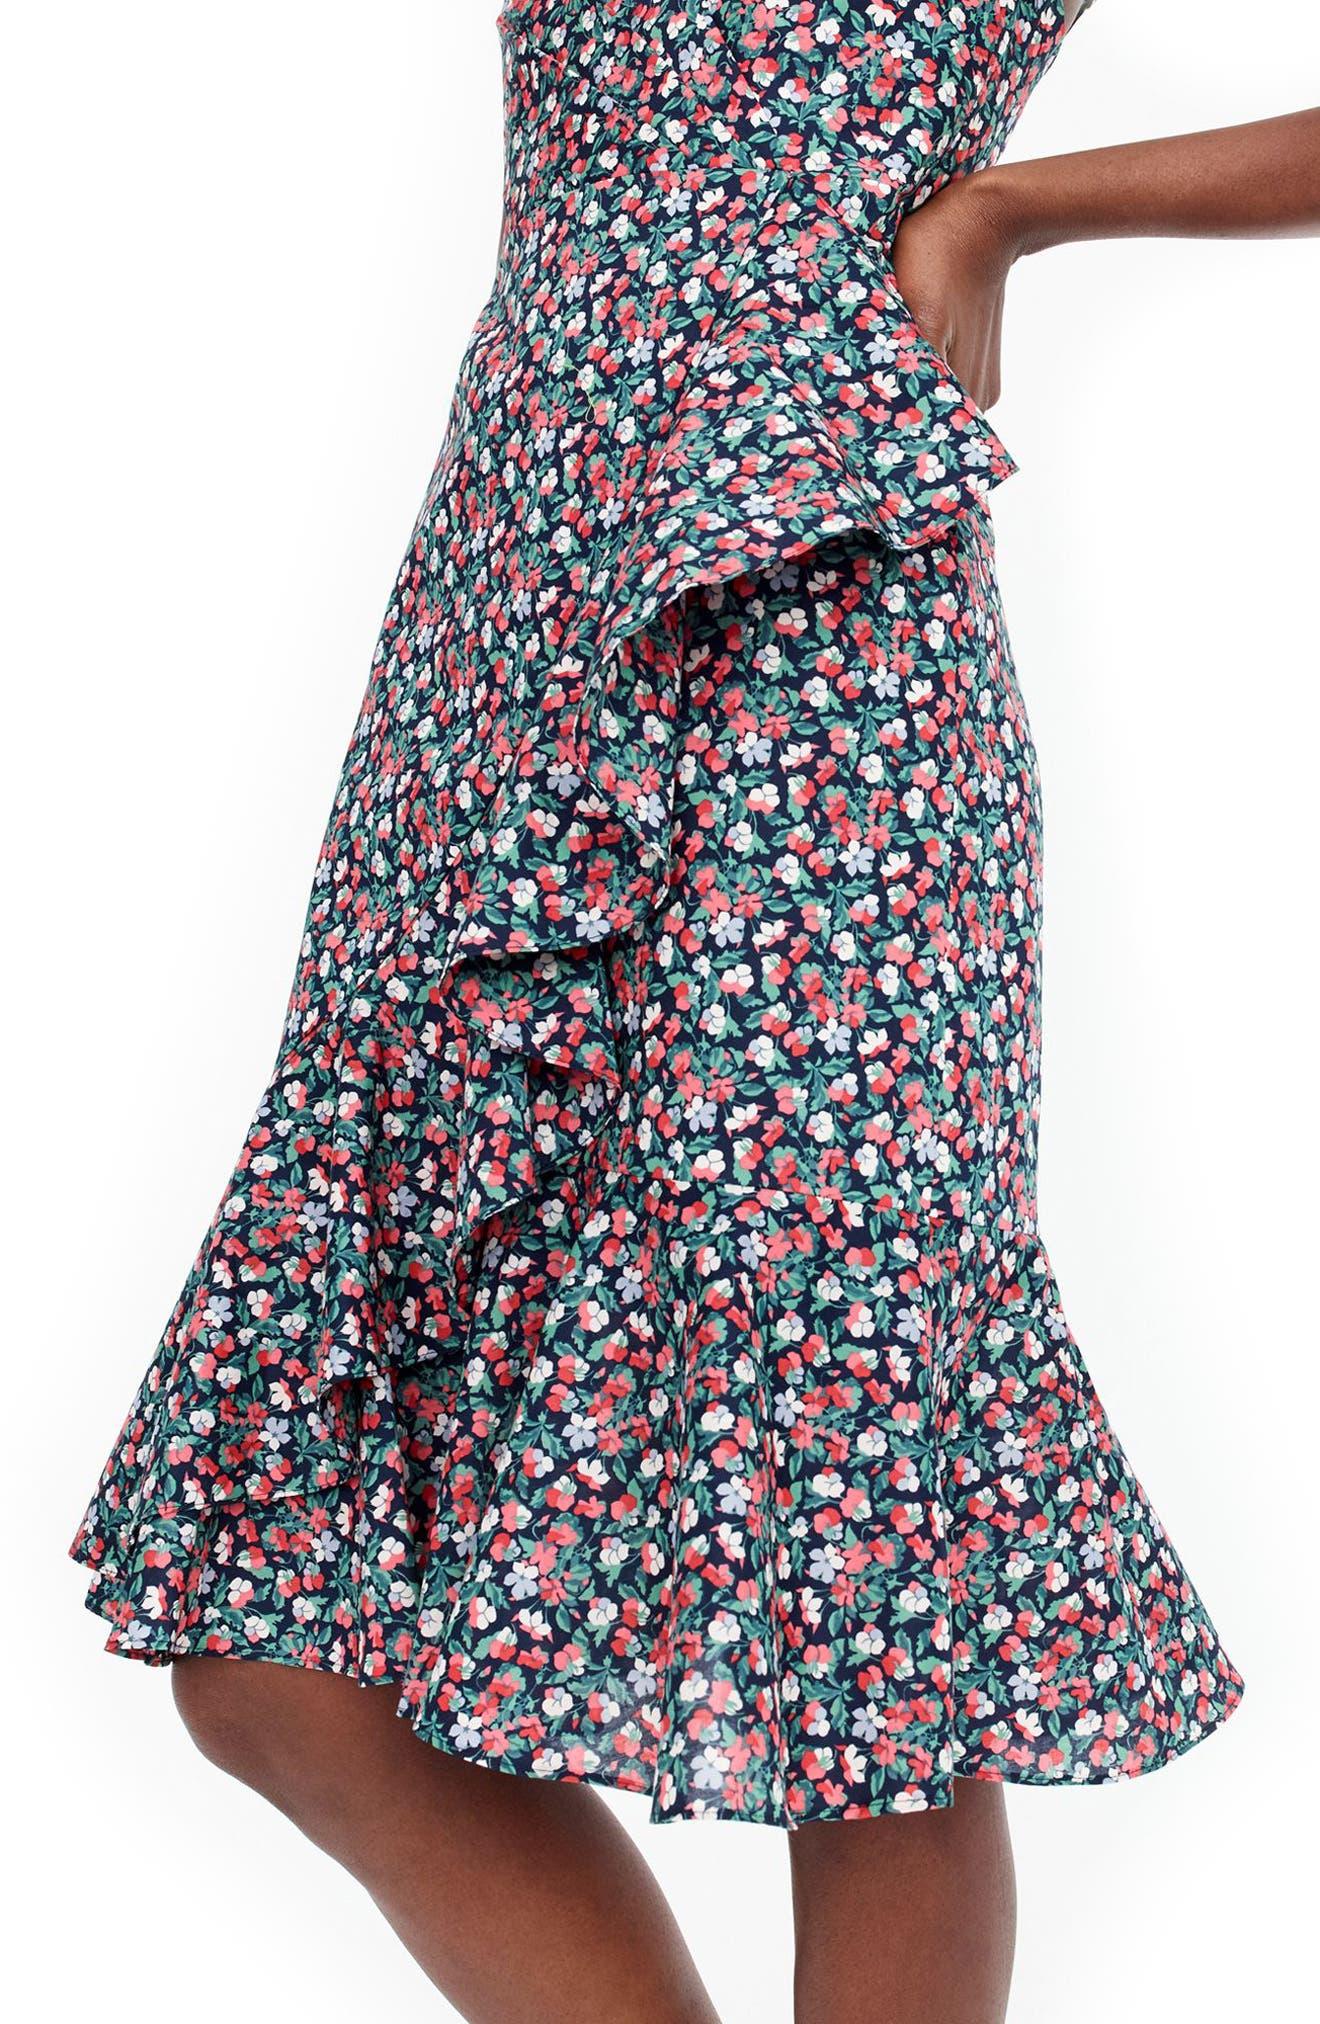 Liberty<sup>®</sup> Sarah Ruffle Dress,                             Alternate thumbnail 3, color,                             400